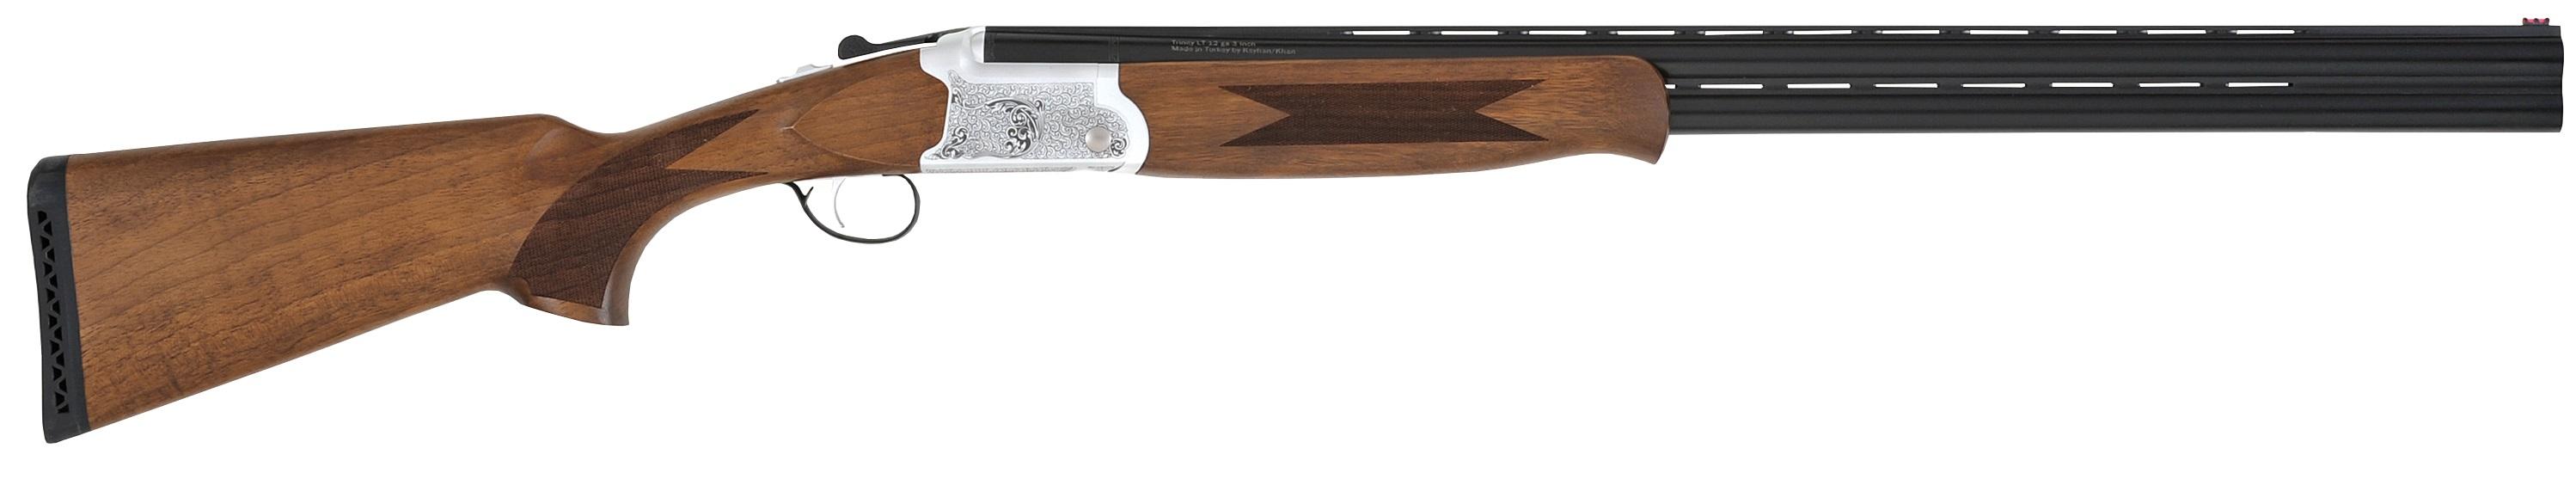 TriStar Sporting Arms TRINITY LT 12 GAUGE